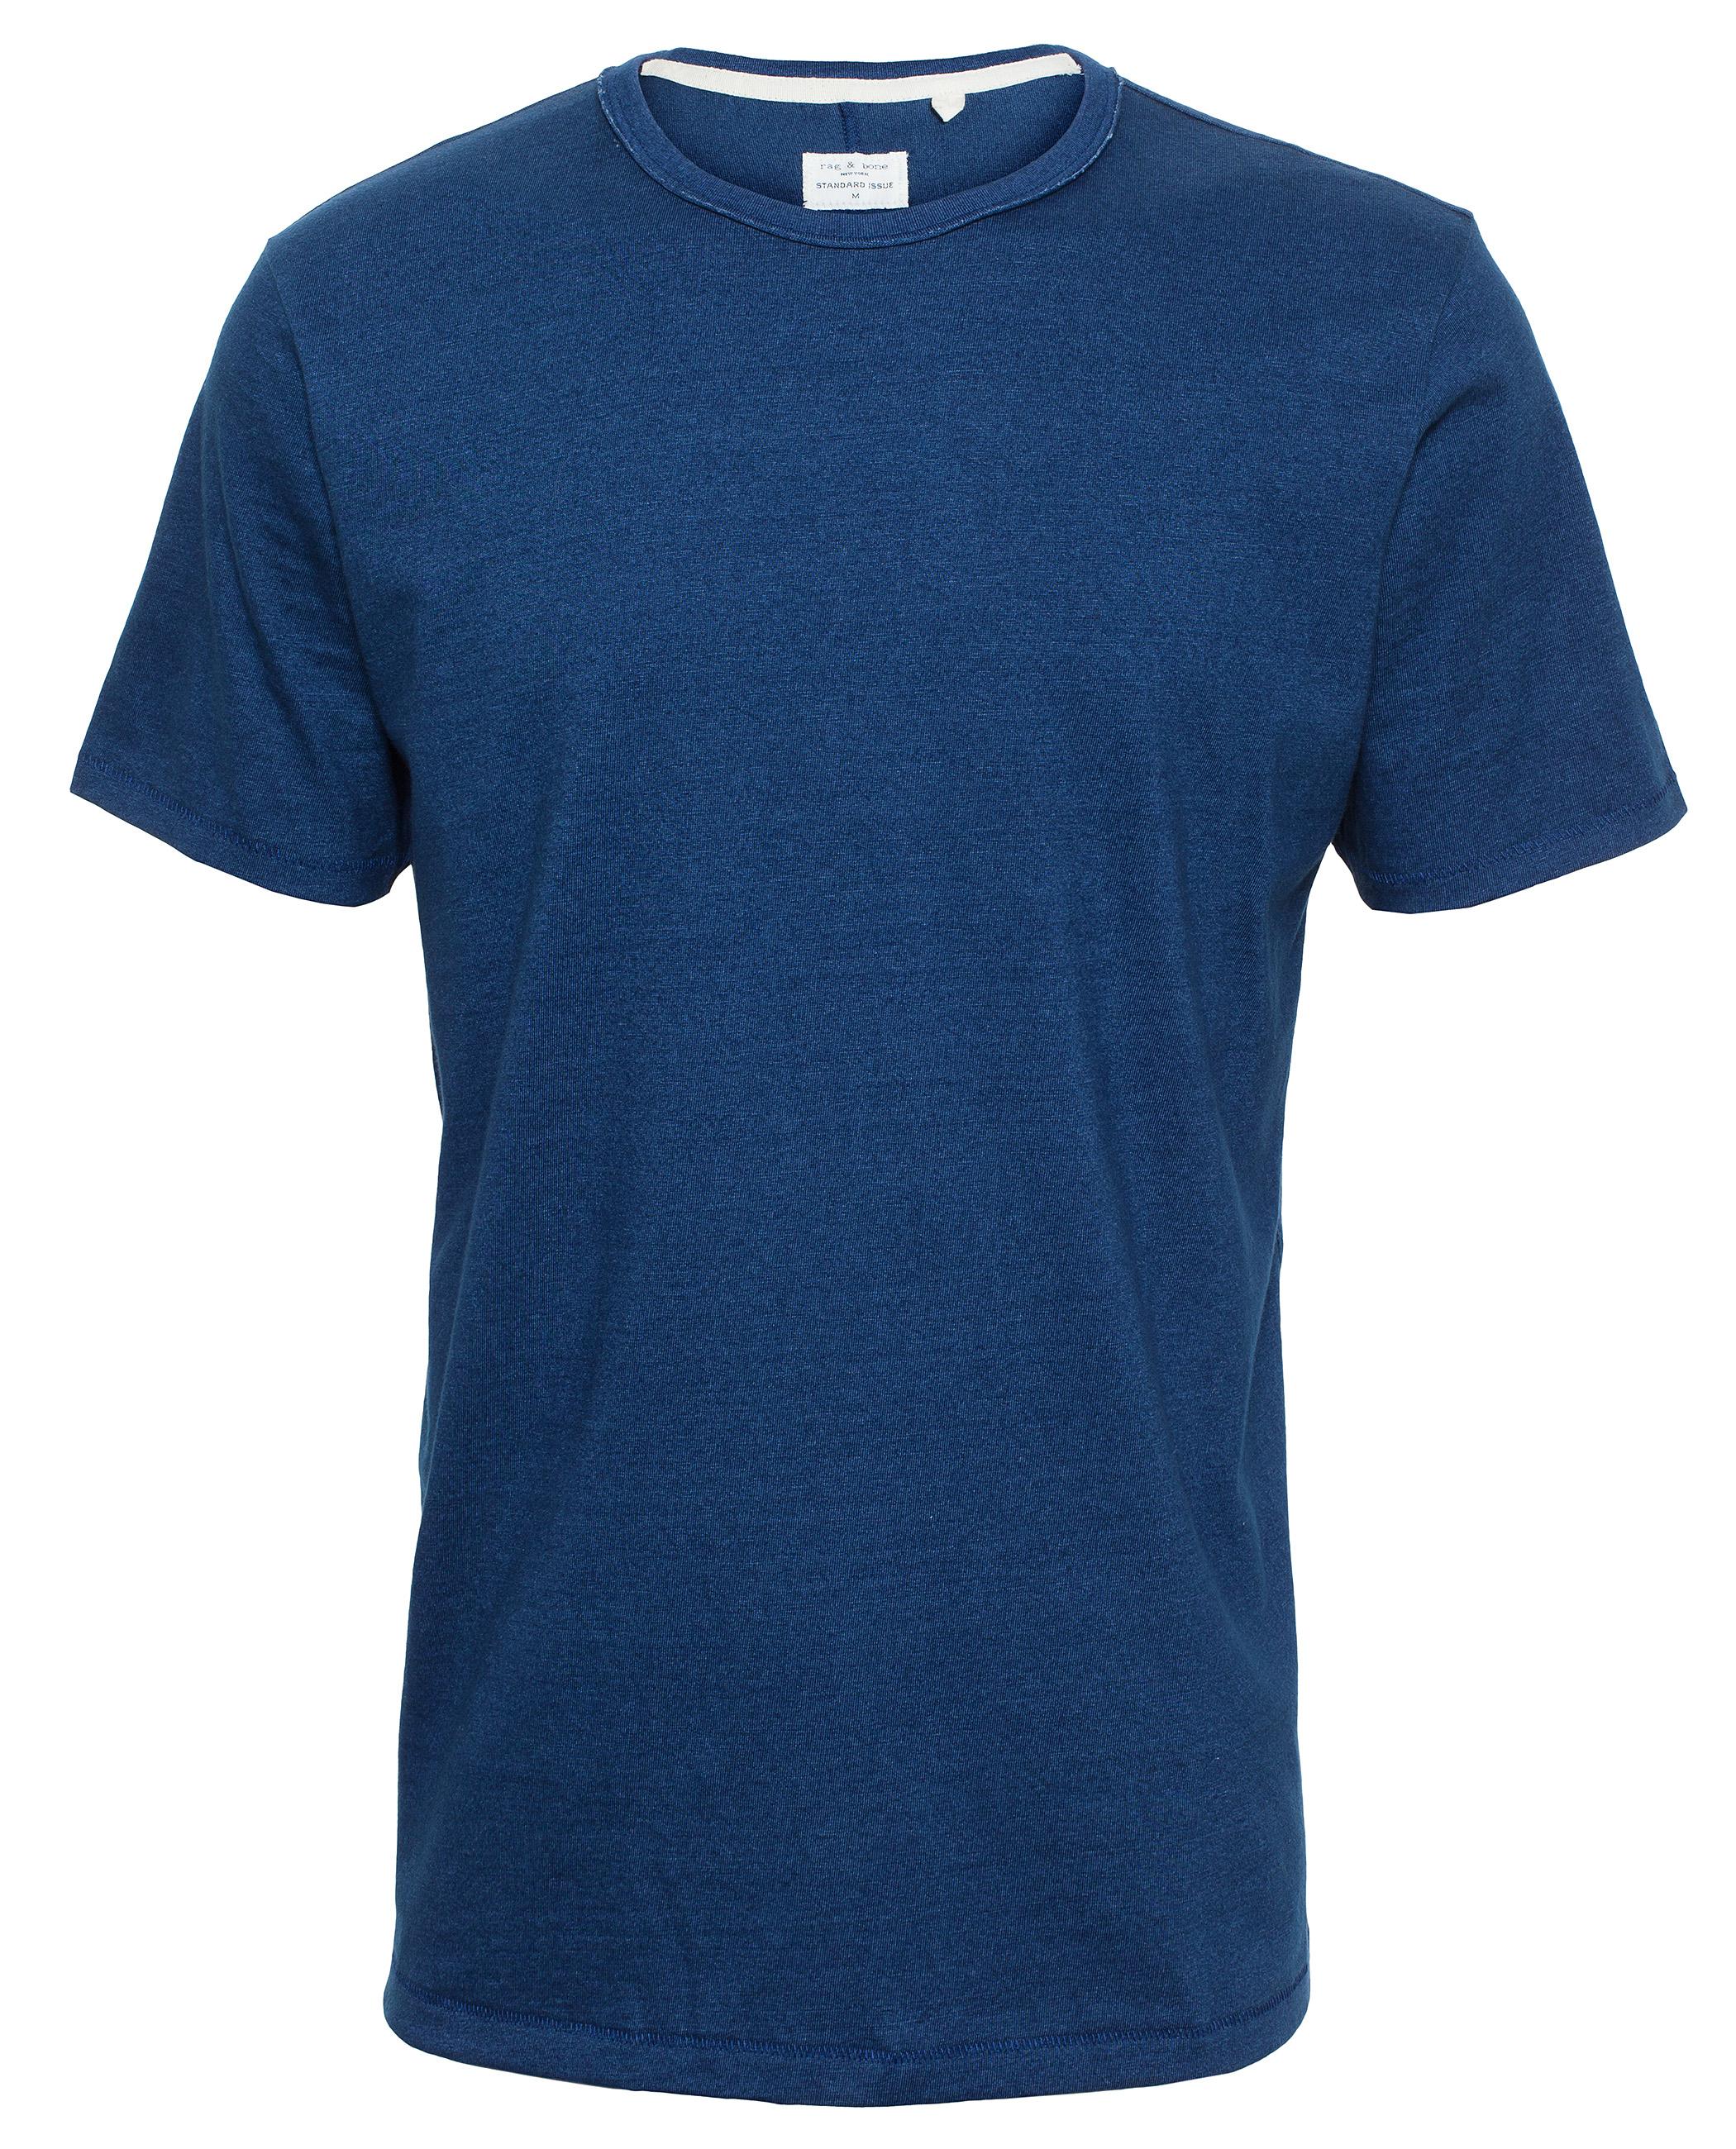 Rag bone basic cotton t shirt in blue for men lyst for Rag and bone t shirts